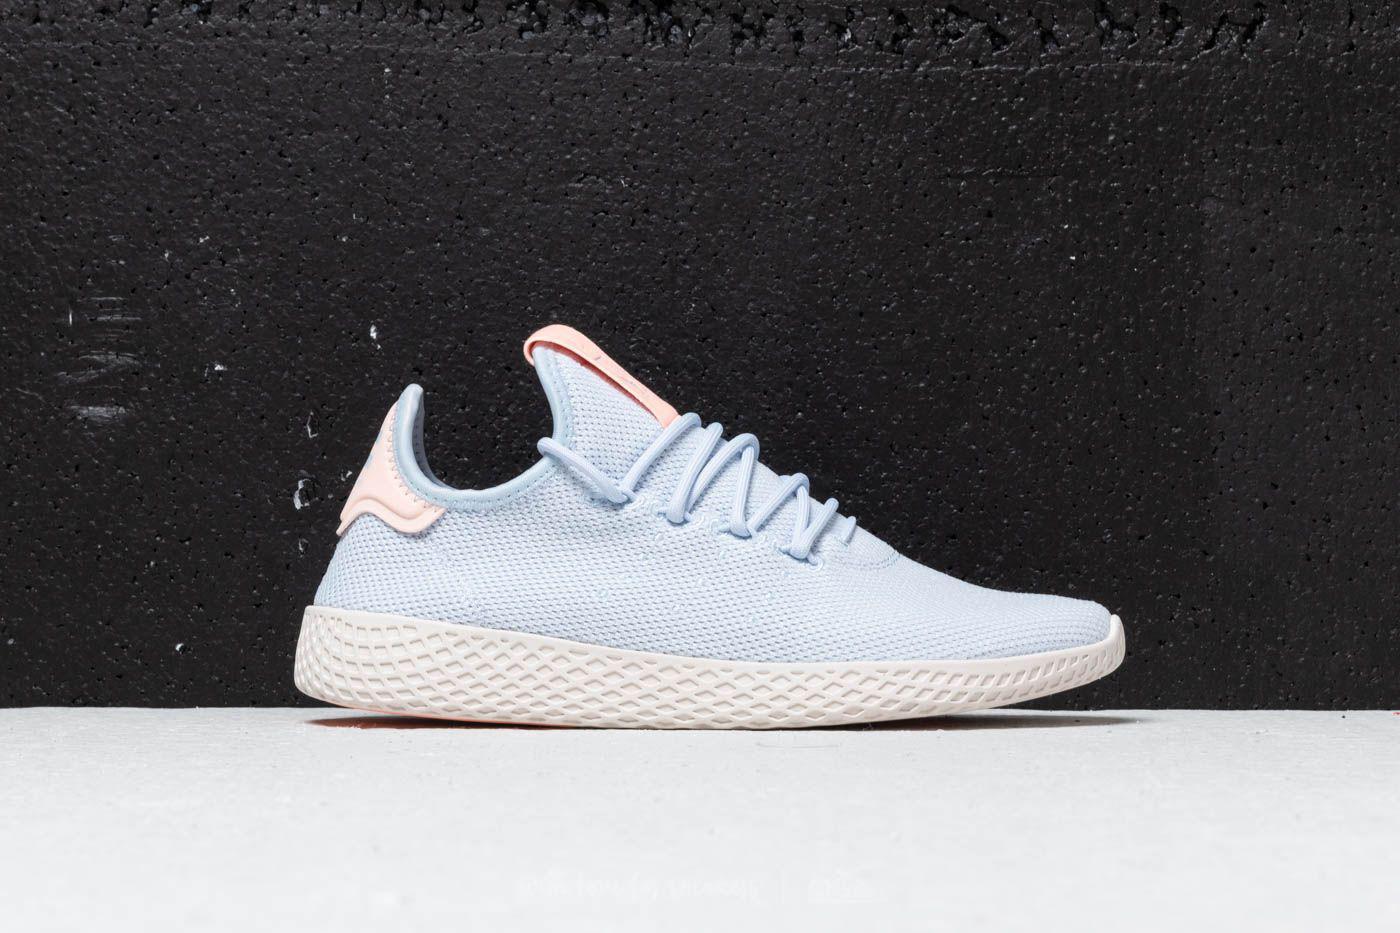 d629df2ab29 adidas Originals Adidas Pharrell Williams Tennis Hu W Aero Blue ...